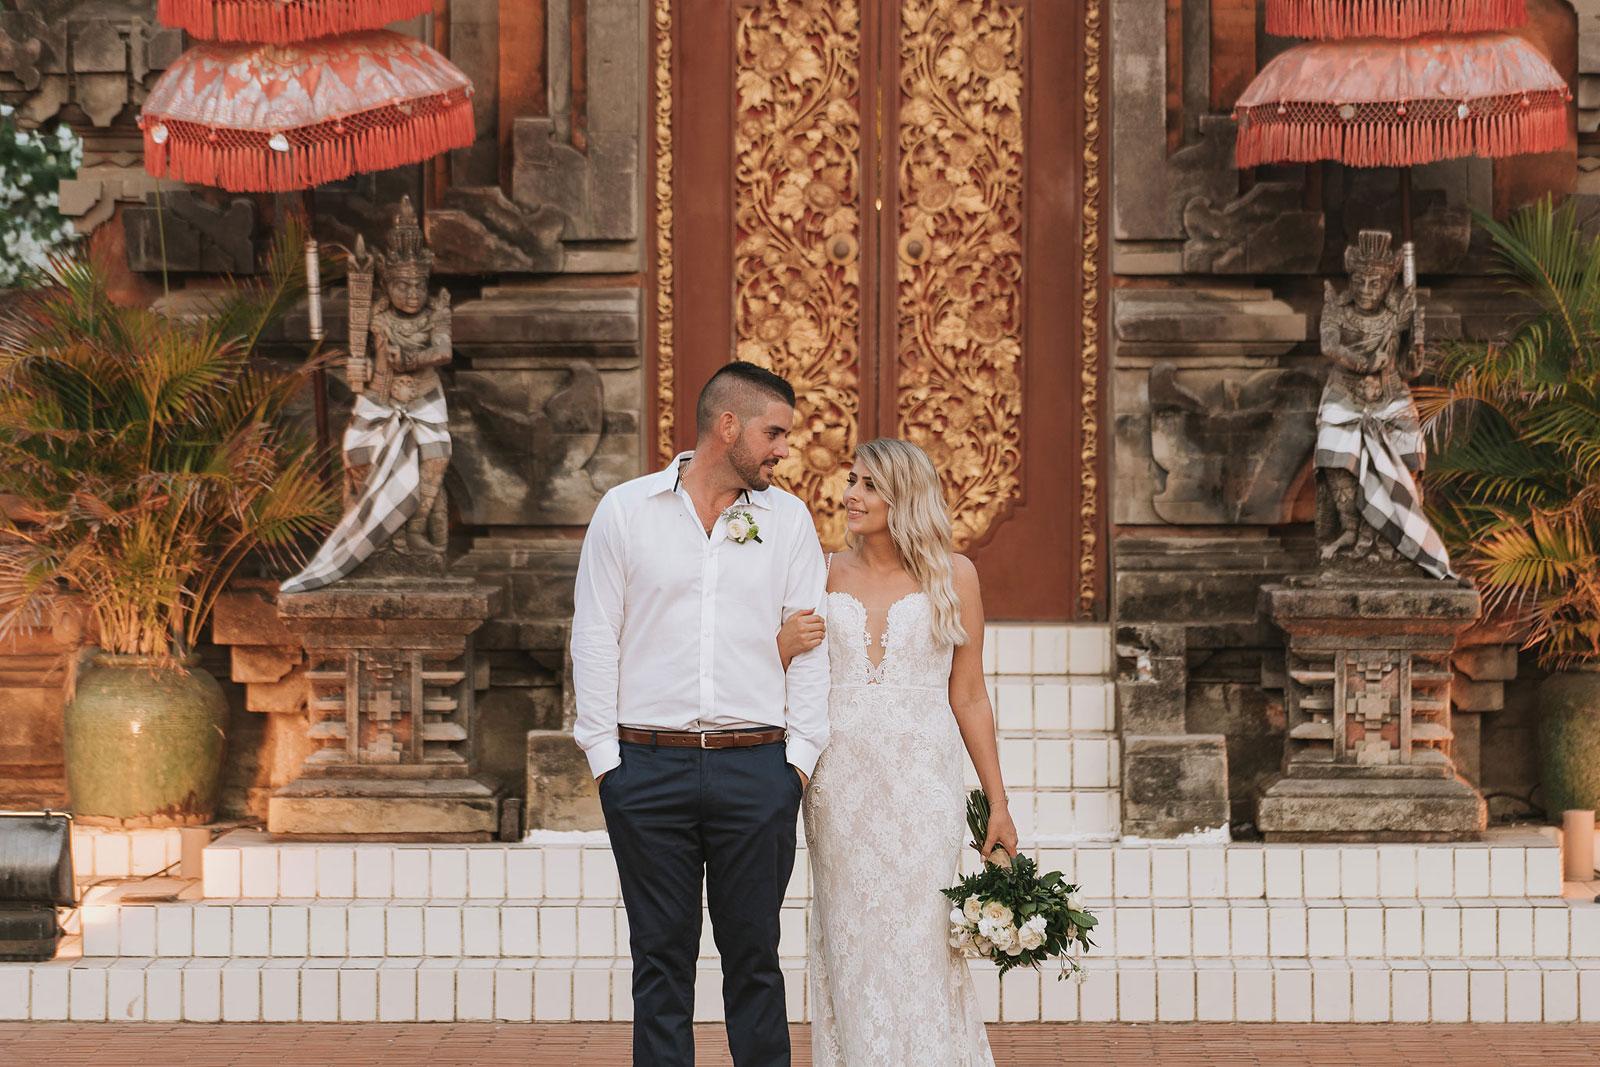 newfound-j-j-bali-nusa-dua-wedding-wedding-photographer-065-a